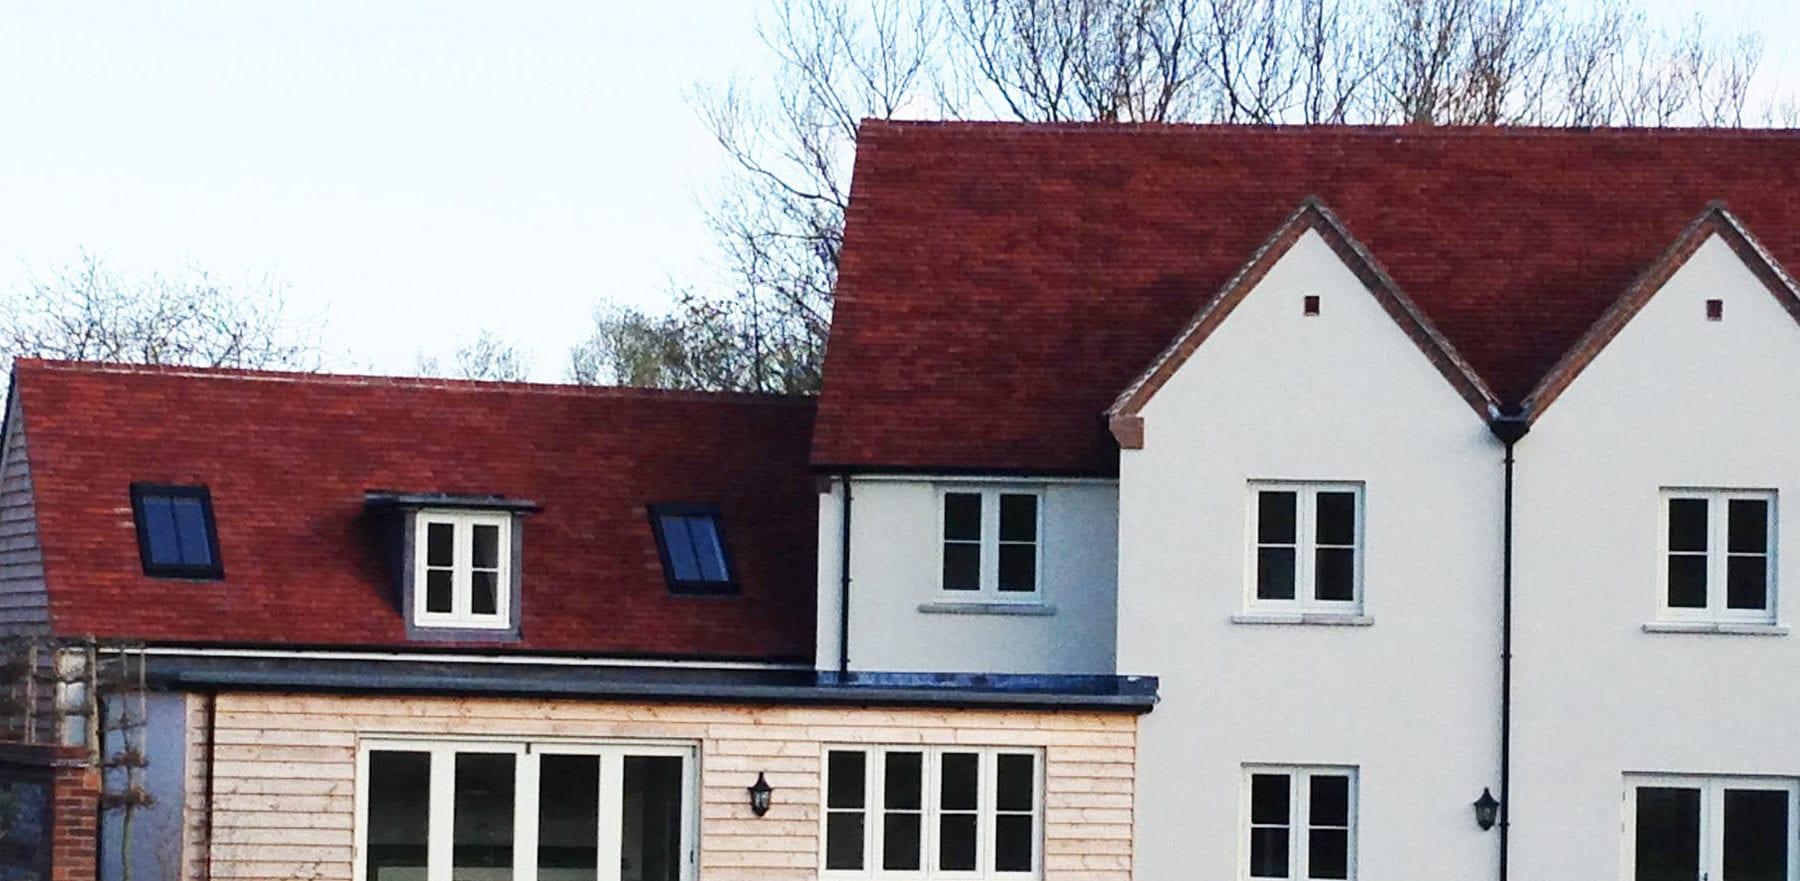 Lifestiles - Handmade Heather Clay Roof Tiles - Salisbury, England 3